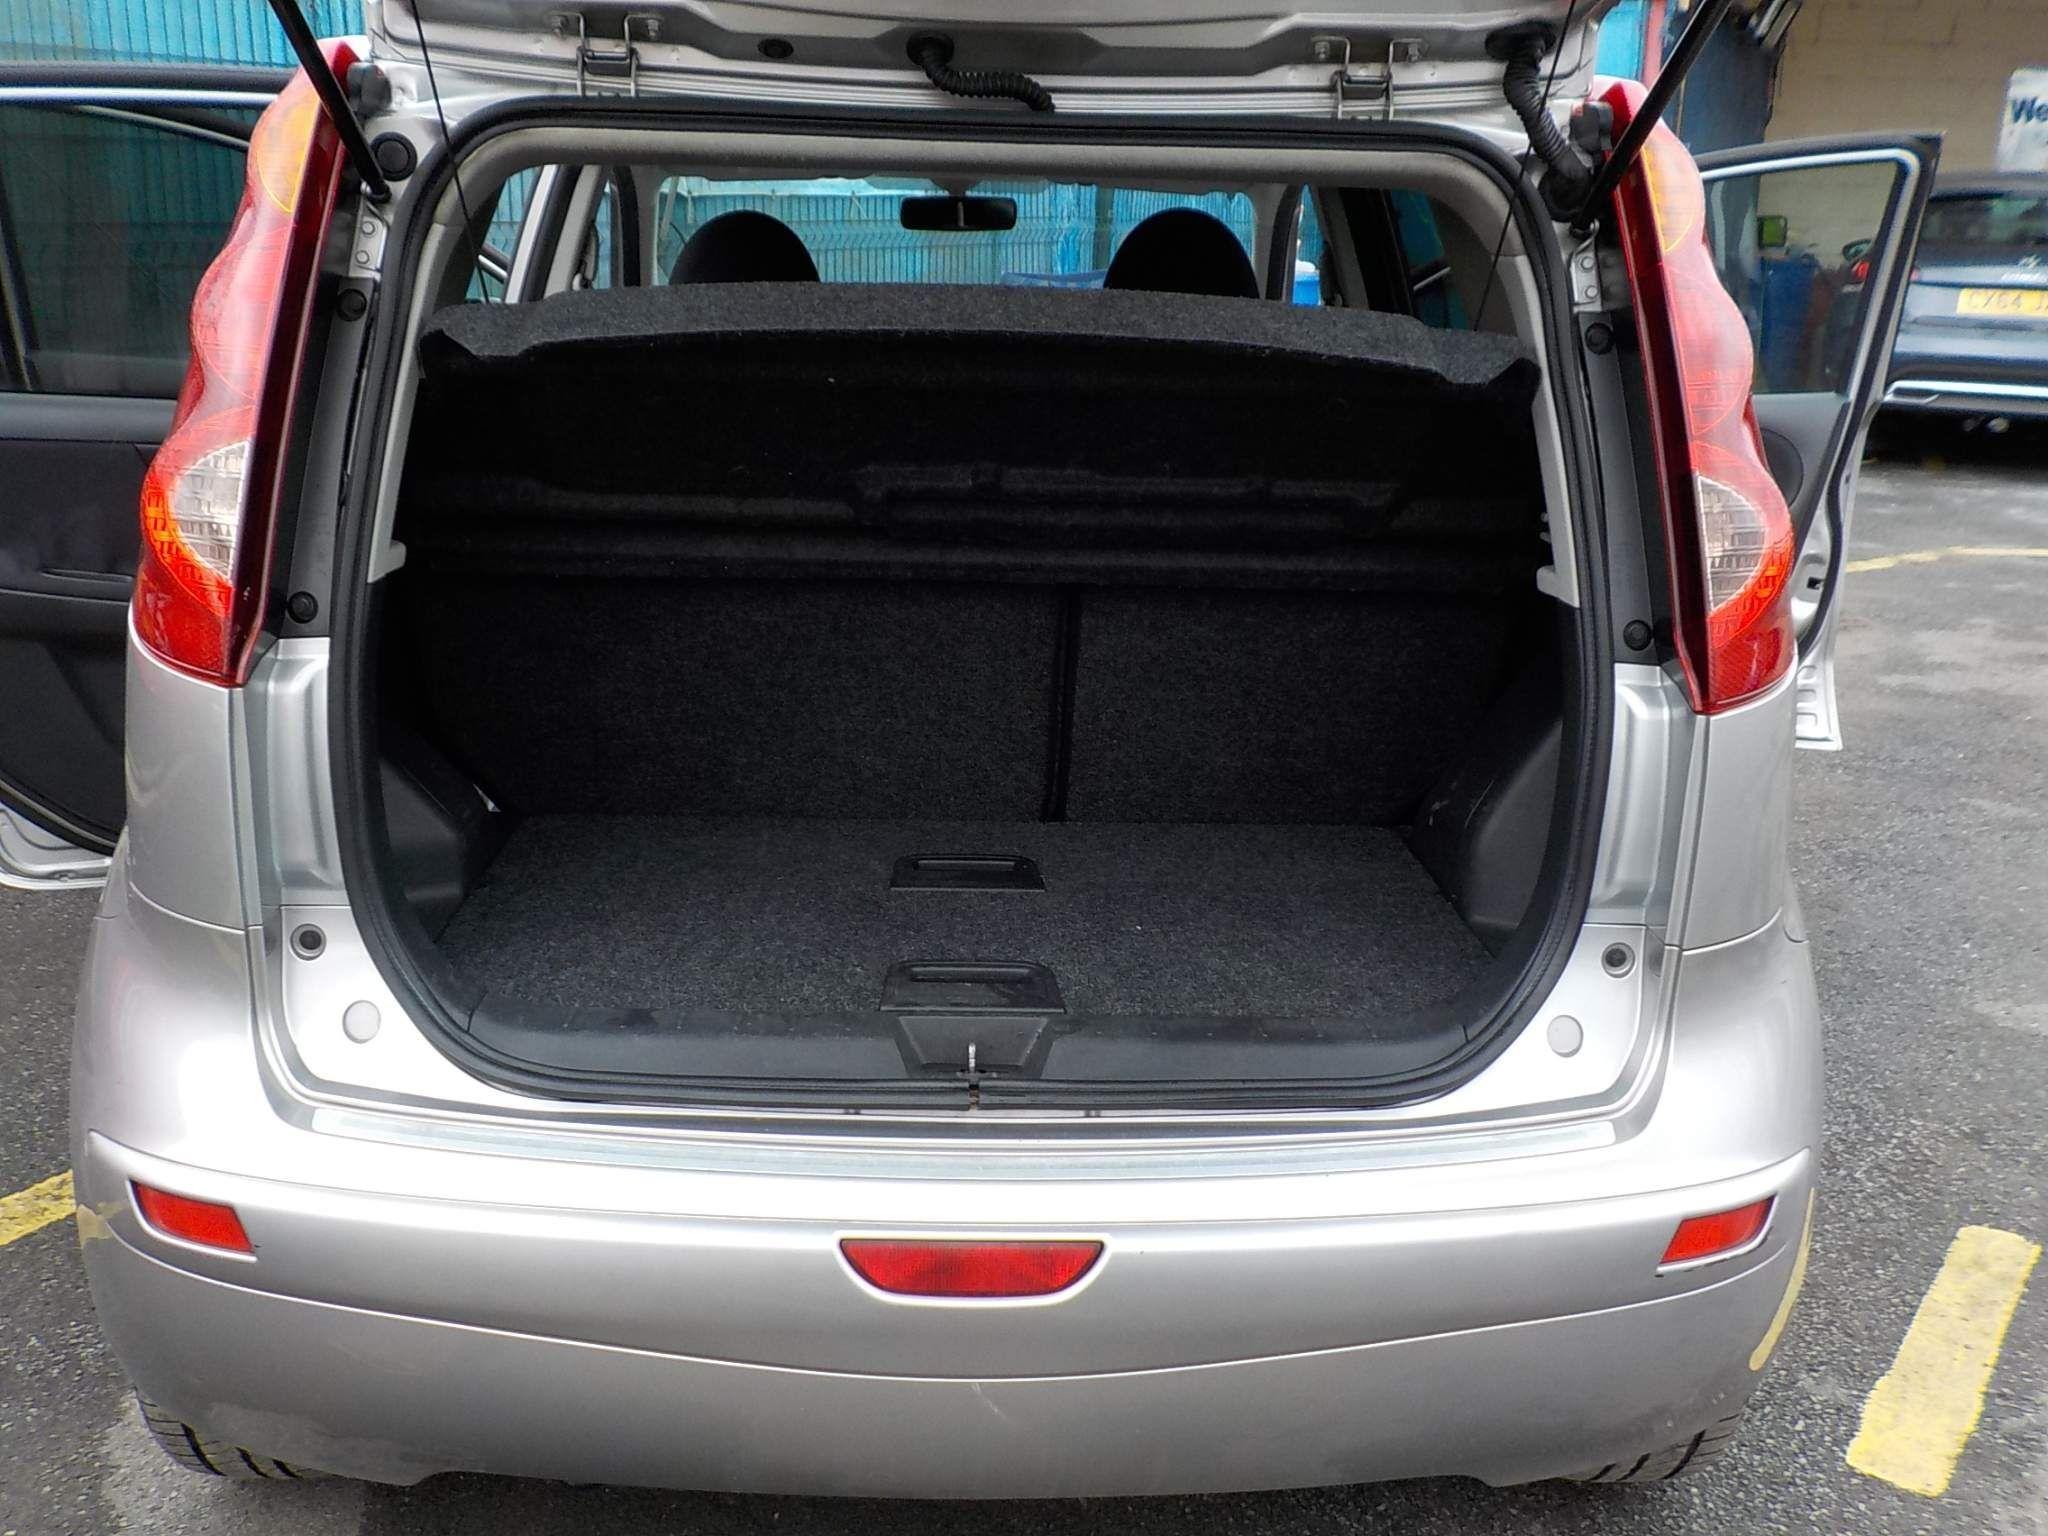 Nissan Note 1.5 dCi n-tec 5dr